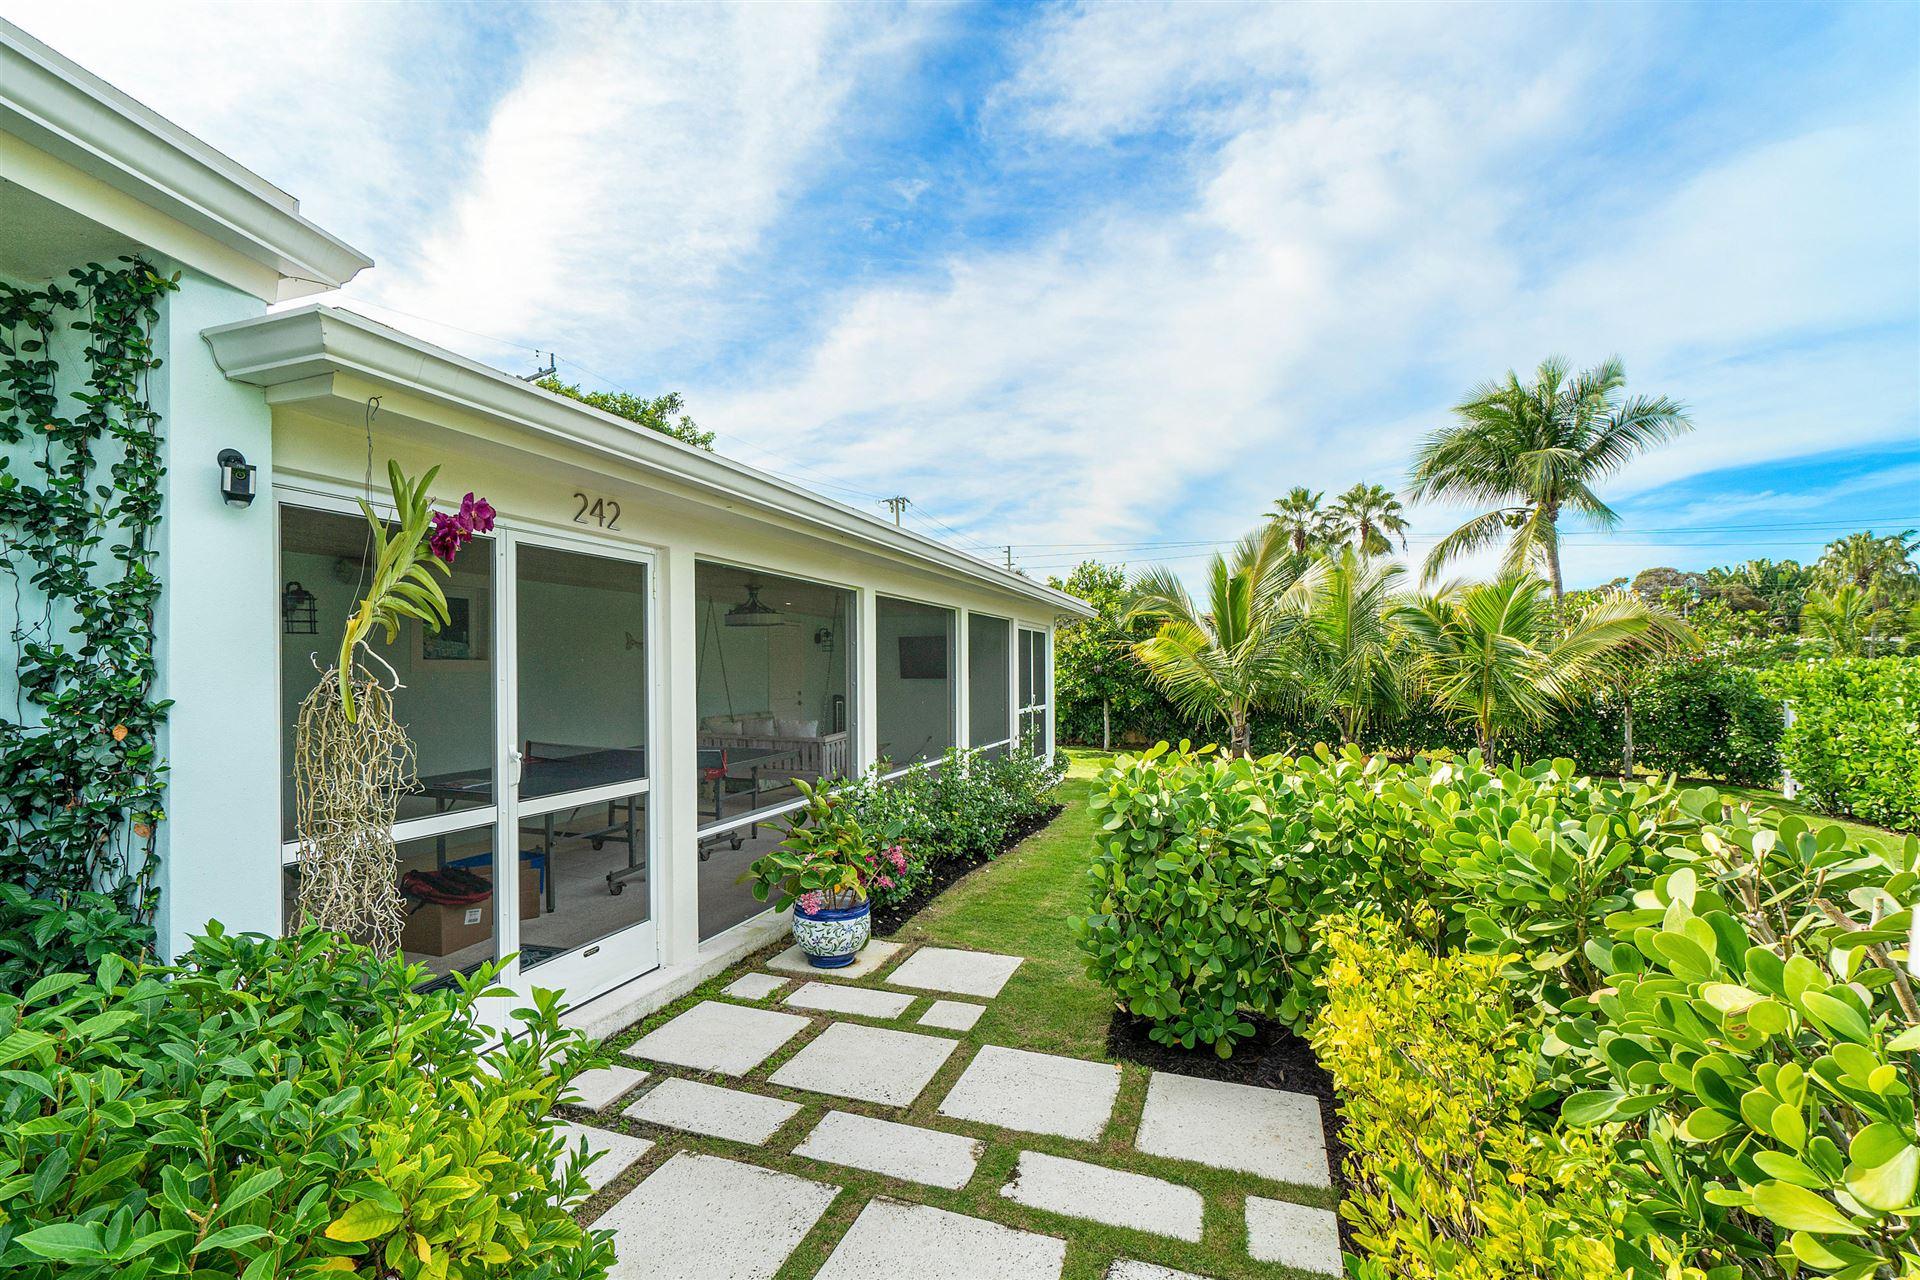 242 Linda Lane, West Palm Beach, FL 33405 - #: RX-10683545